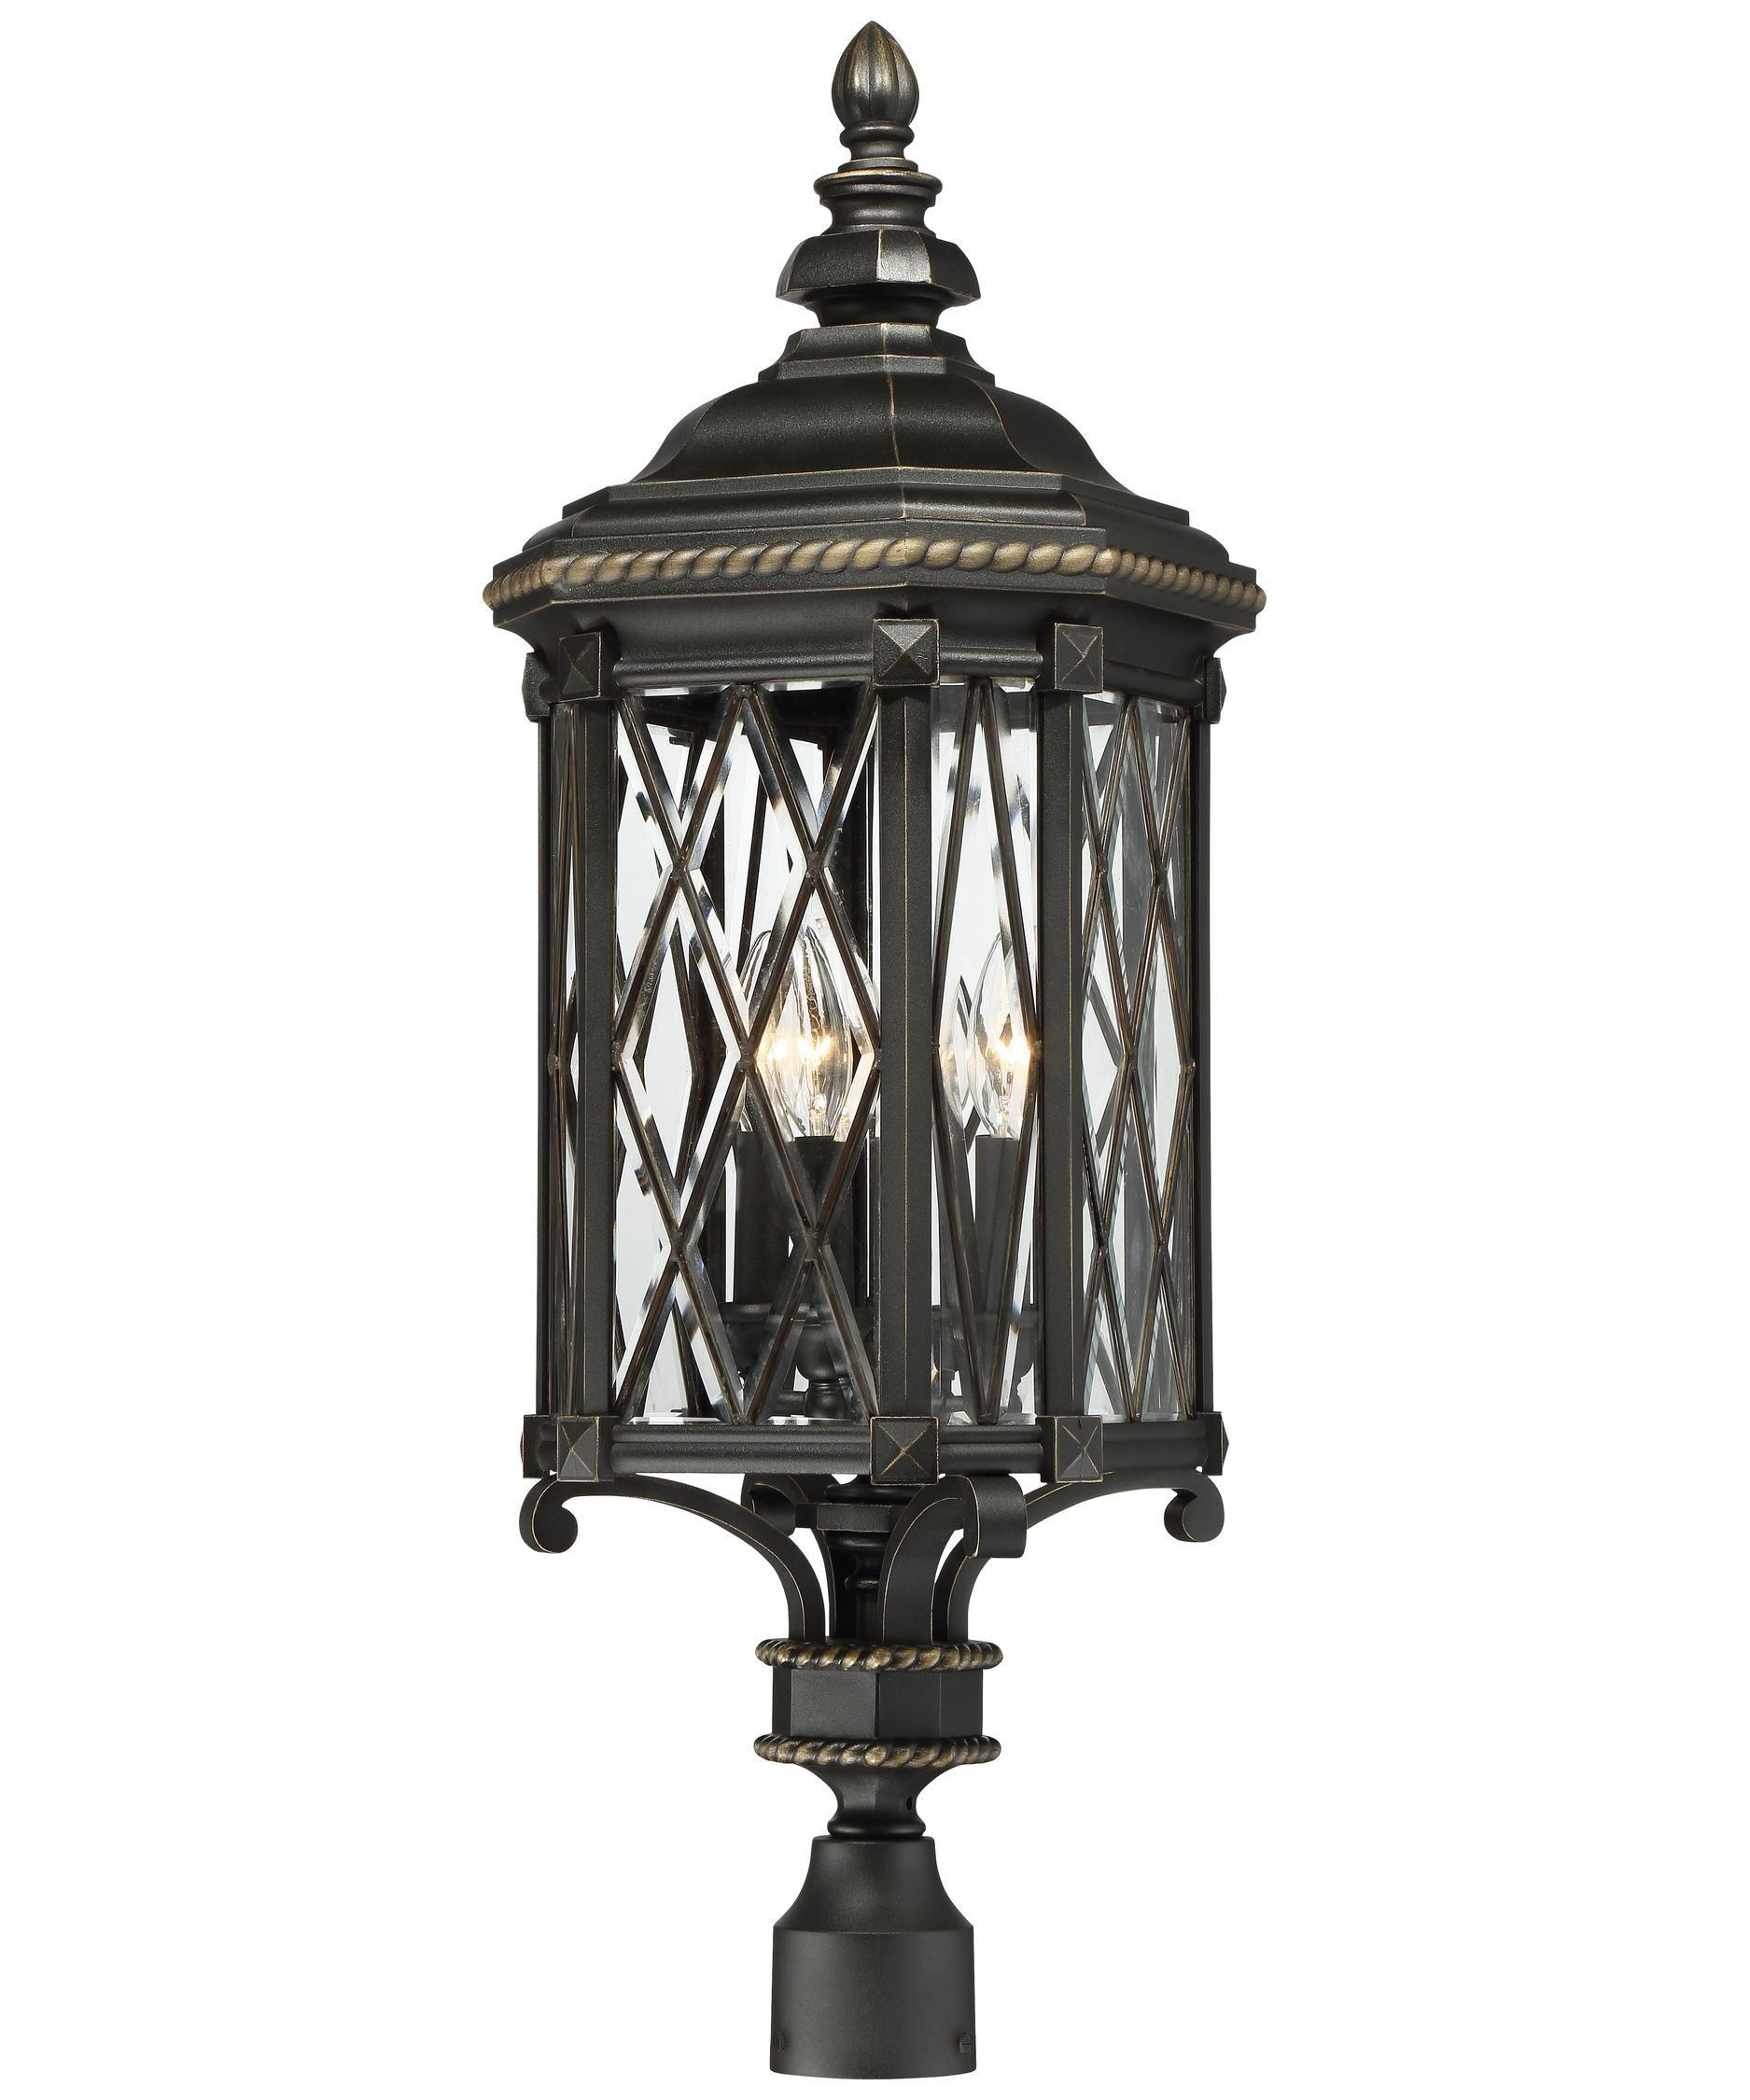 Bexley Manor 32 Inch Tall 4 Light Outdoor Post Lamp By Minka Lavery Outdoor Post Lights Post Lights Post Lighting